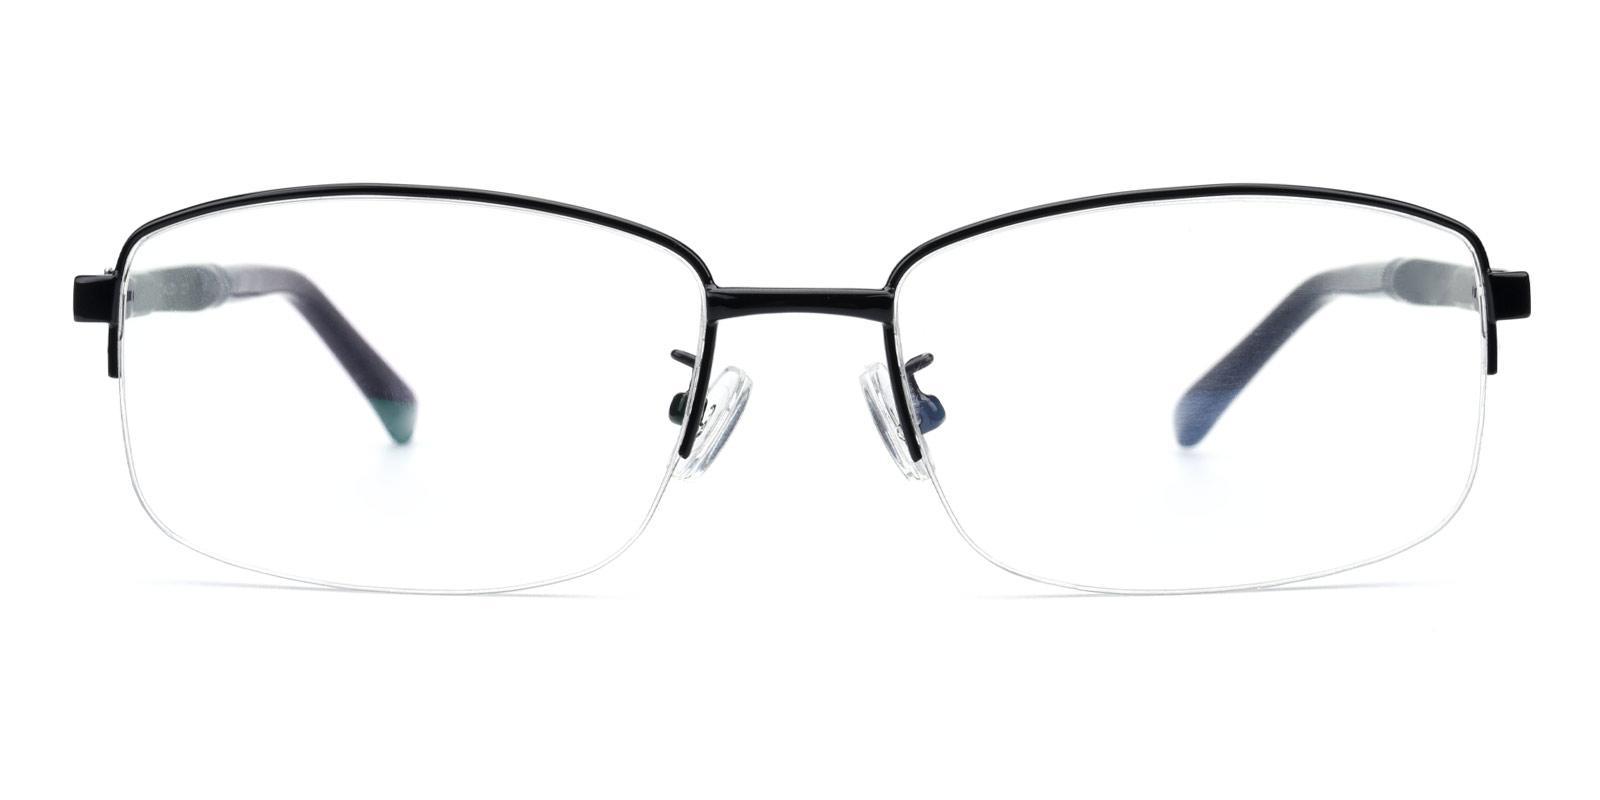 Karma-Black-Rectangle-Metal-Eyeglasses-additional2